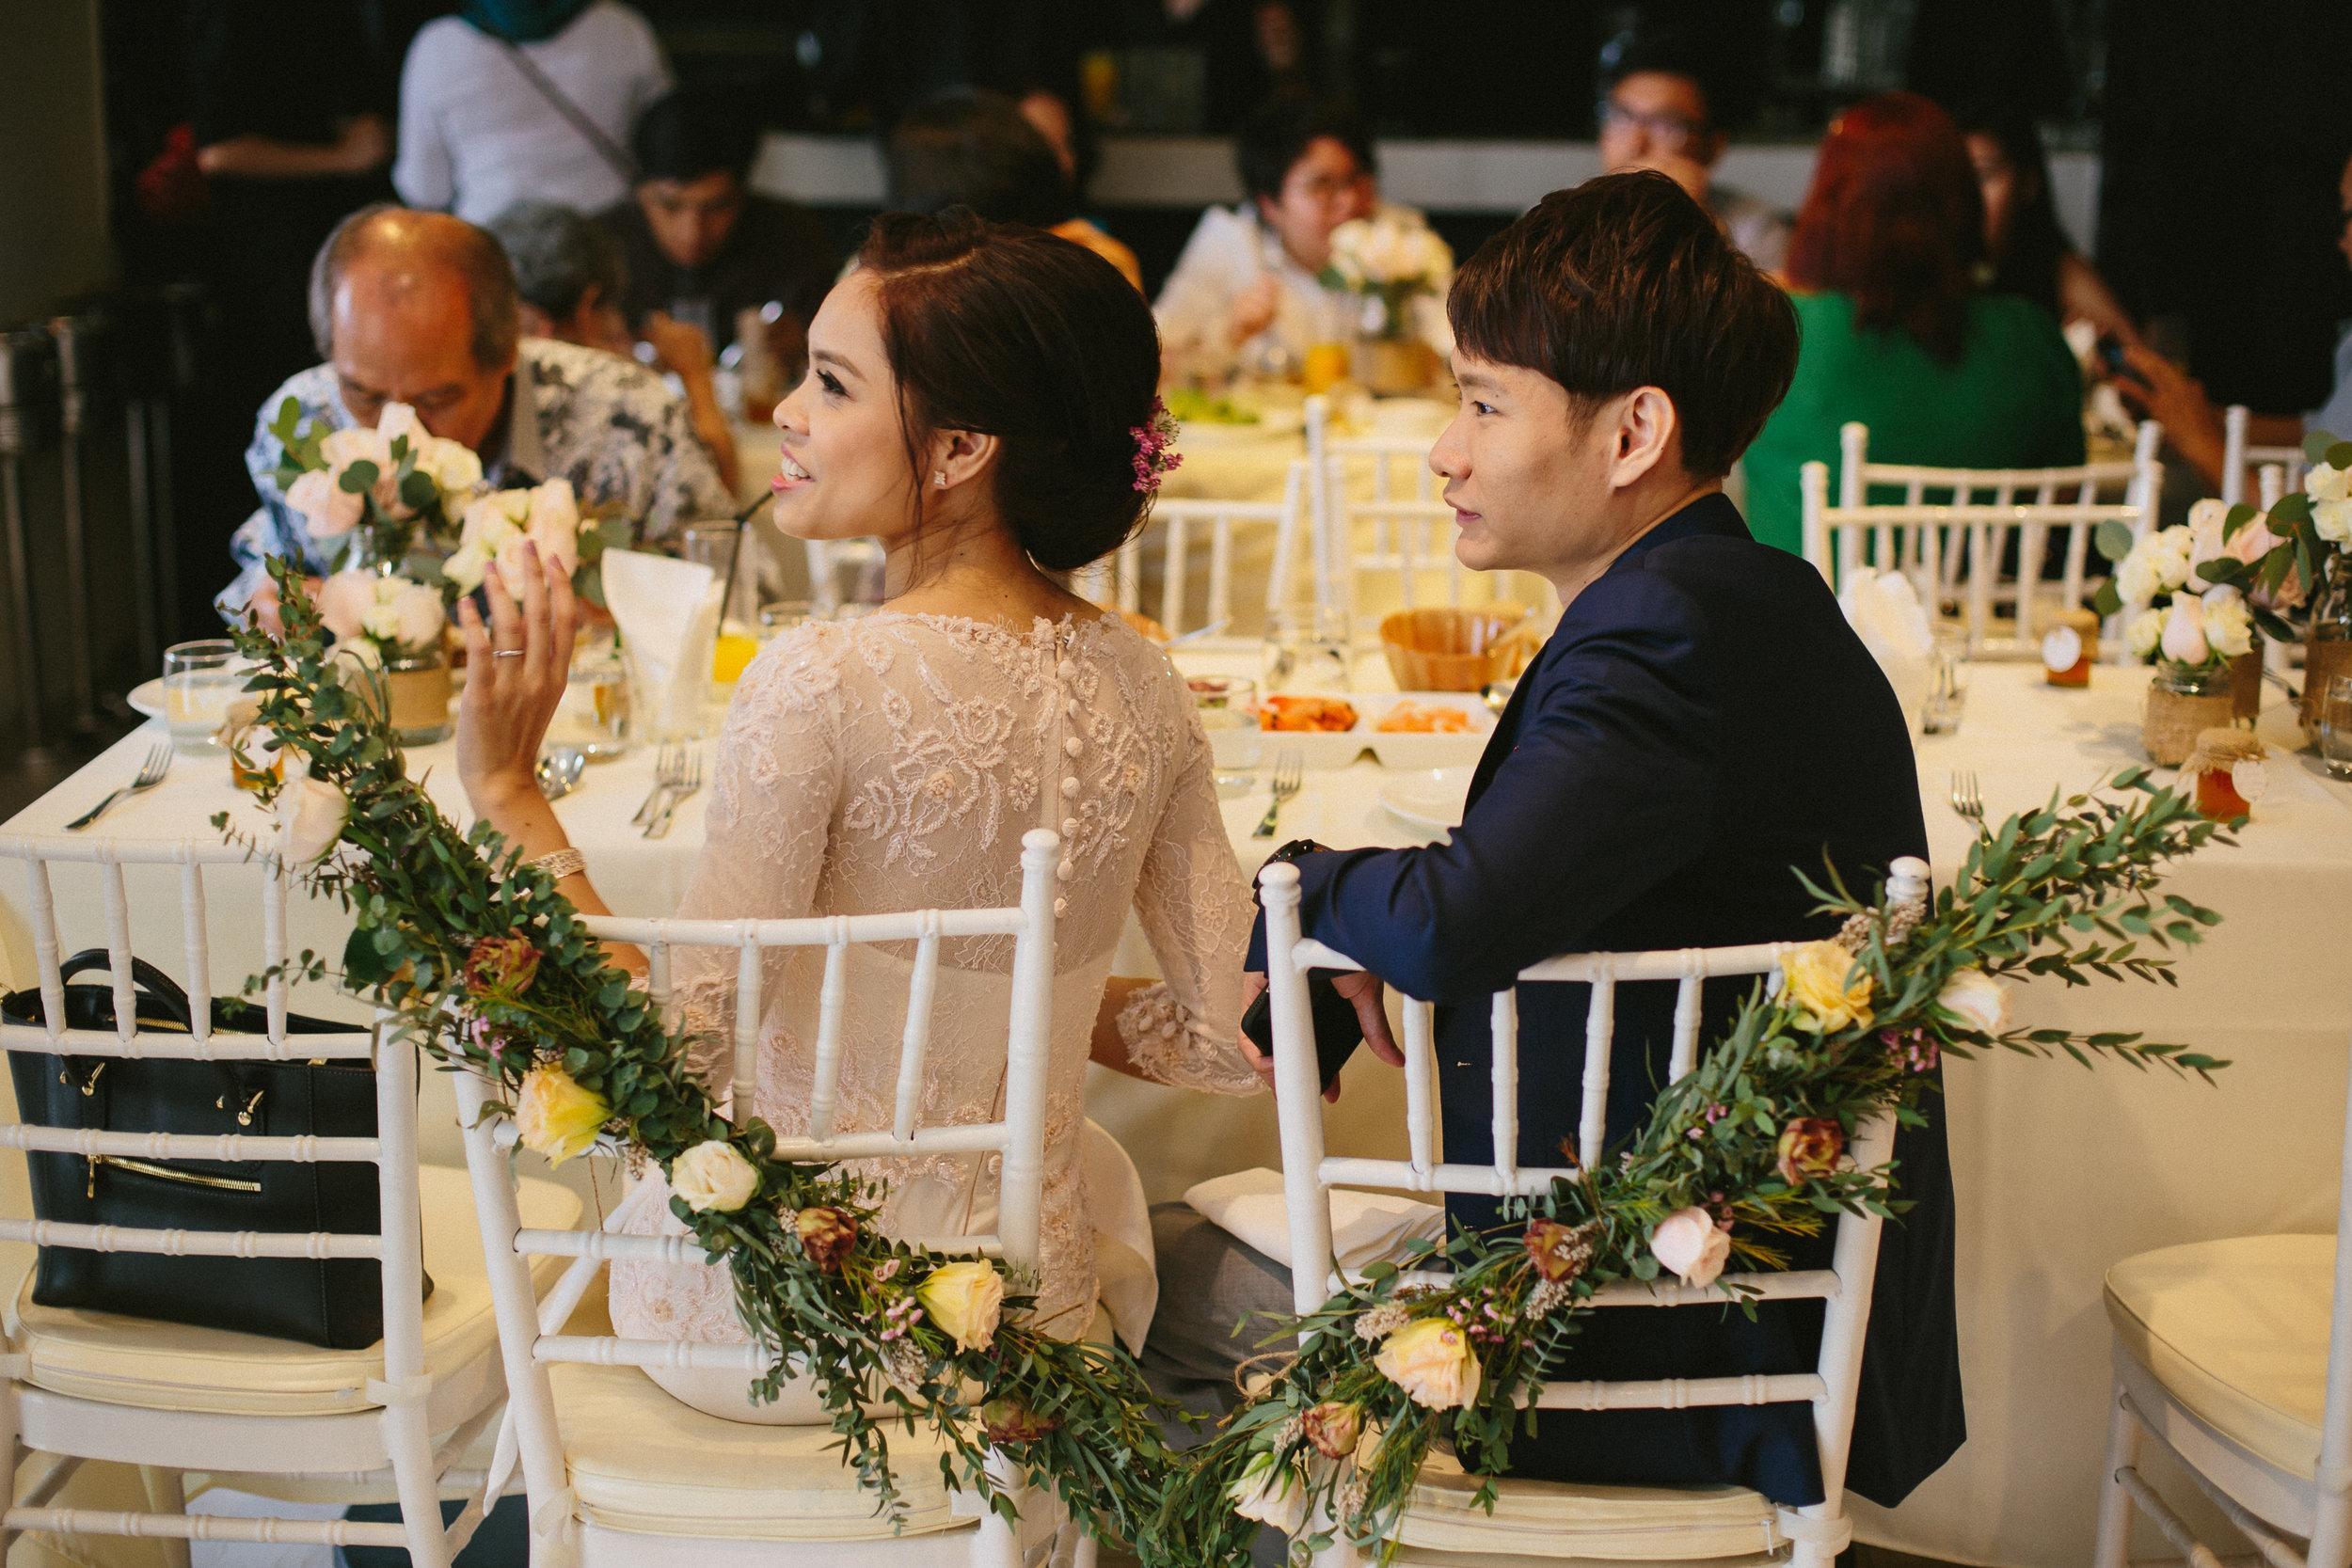 singapore-wedding-photographer-fadilah-kwan-036.jpg